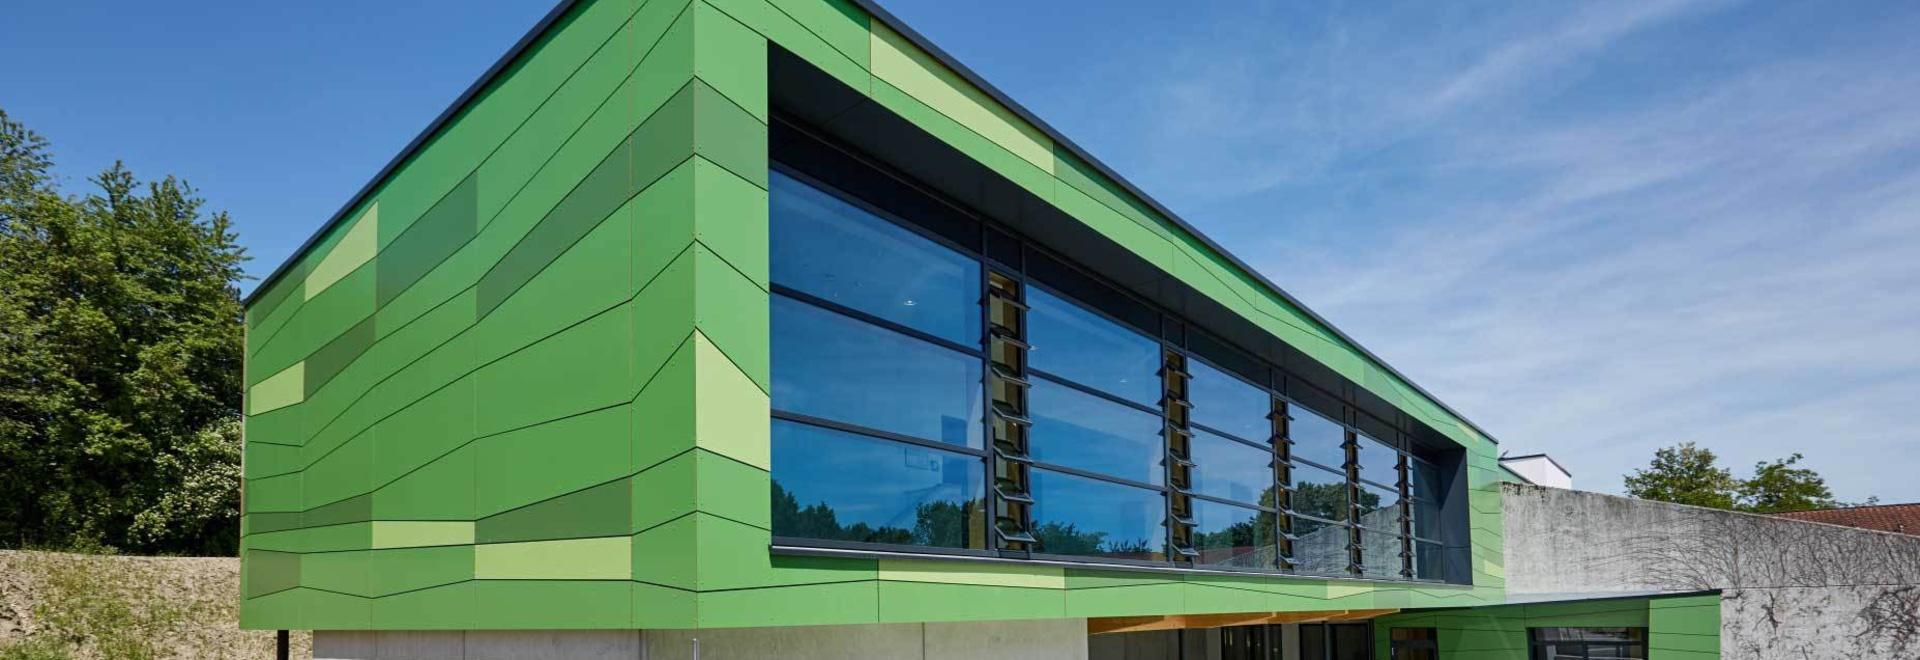 Escuela de Betty-Greif, Pfarrkirchen, Alemania